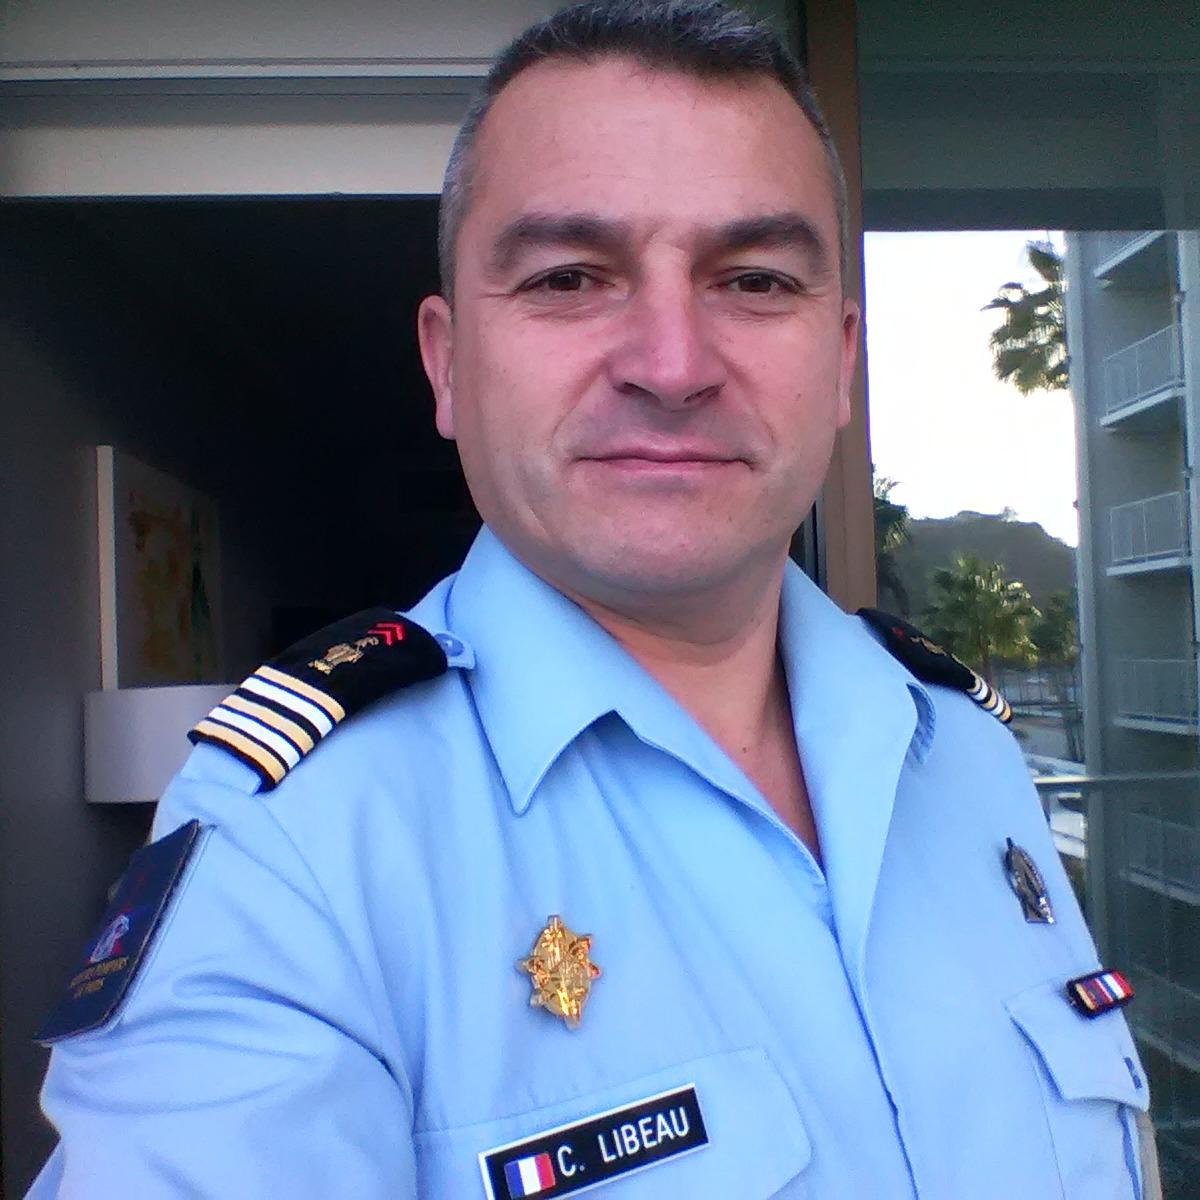 Christophe LIBEAU Pic